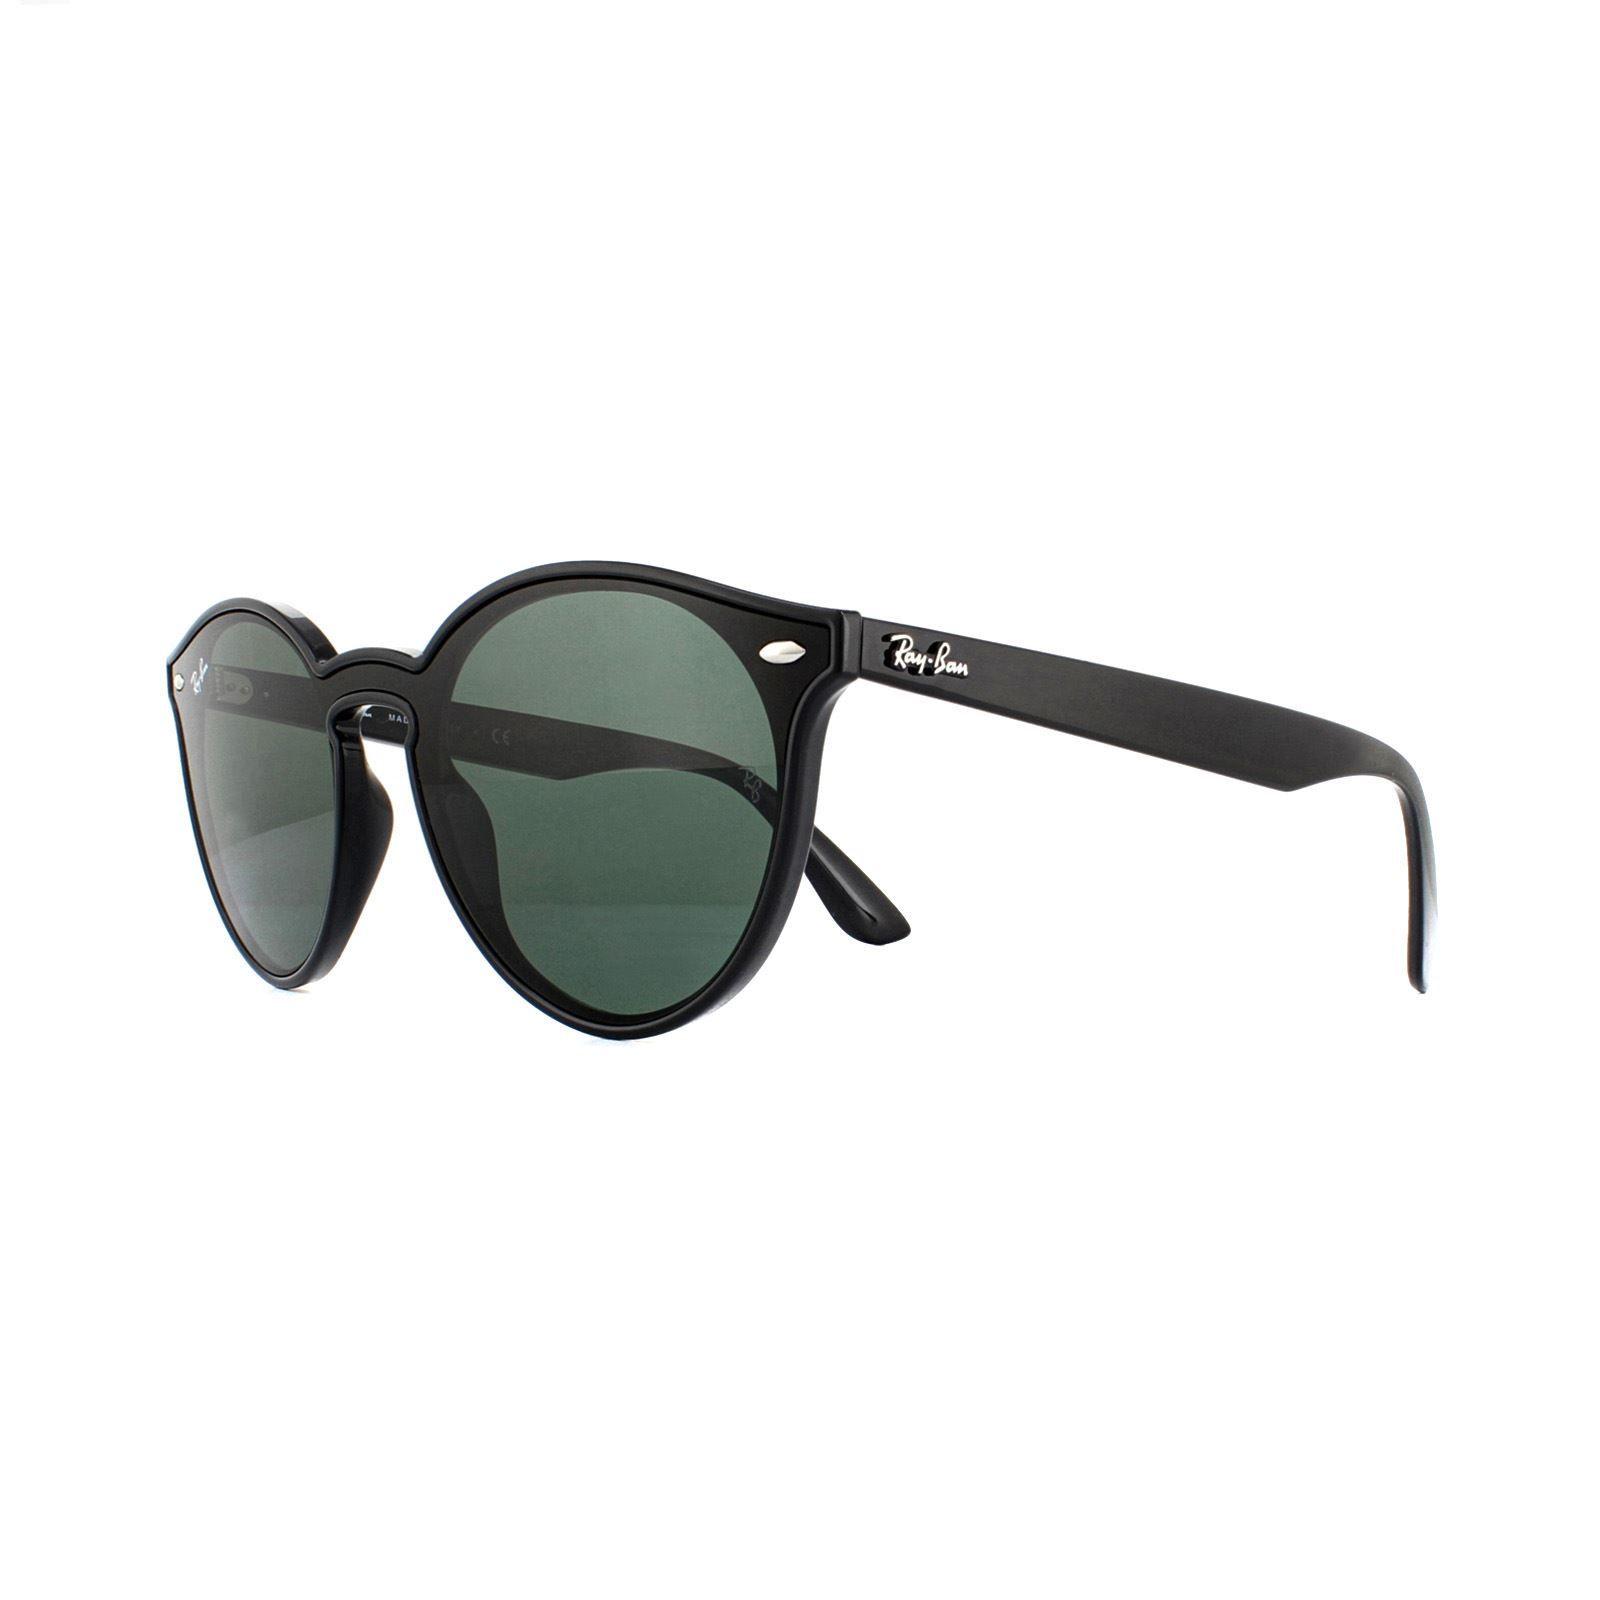 Ray-Ban Sunglasses RB4380N 601/71 Black Green